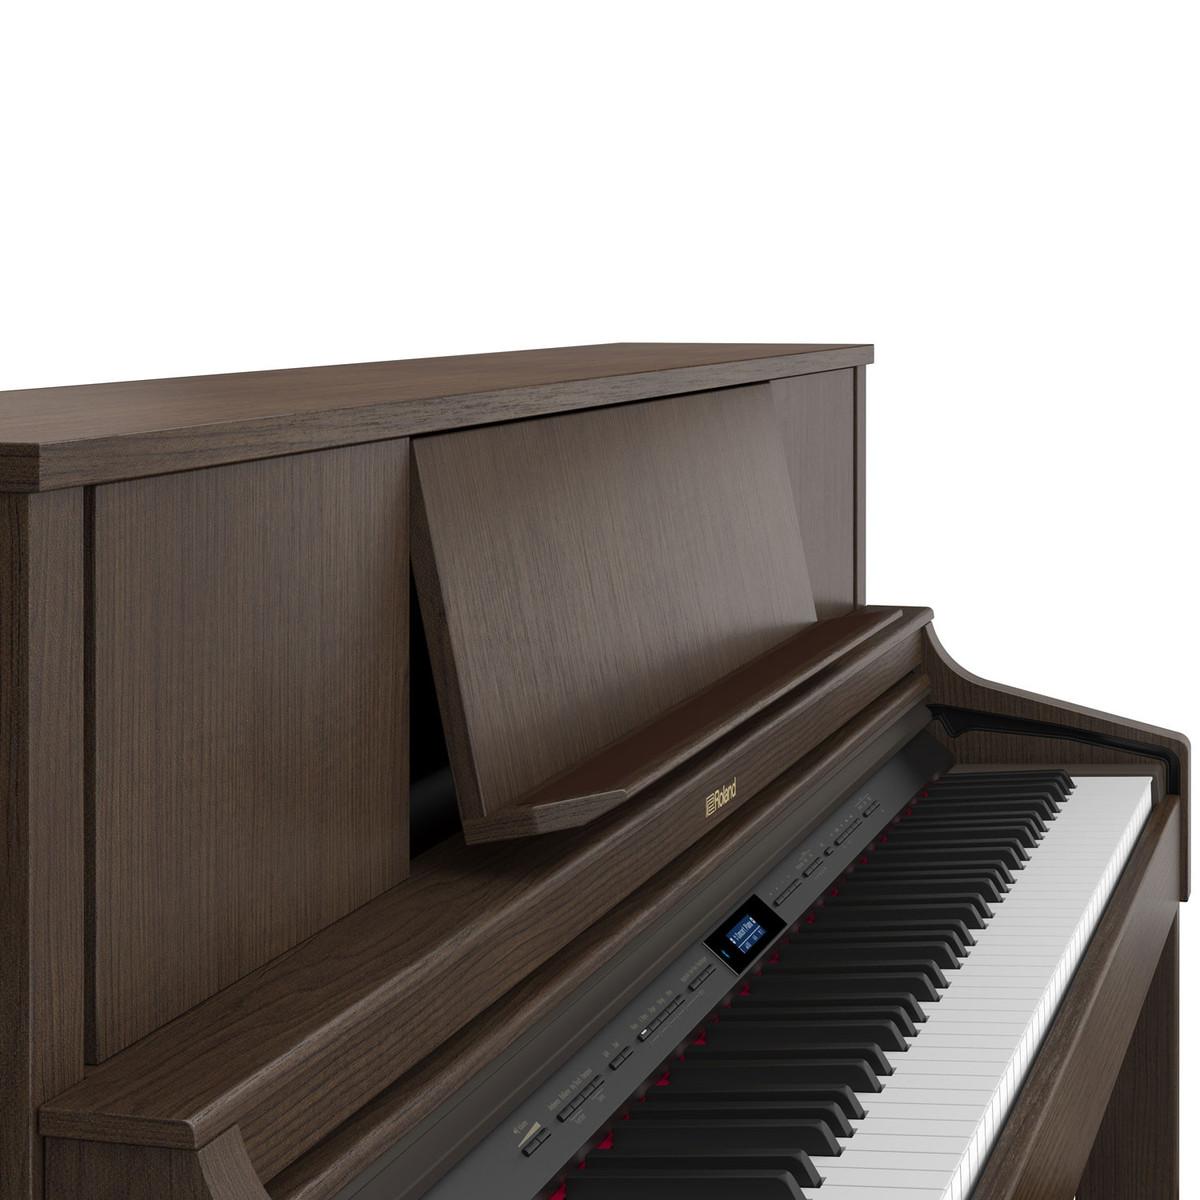 roland lx7 digital piano brown walnut at. Black Bedroom Furniture Sets. Home Design Ideas